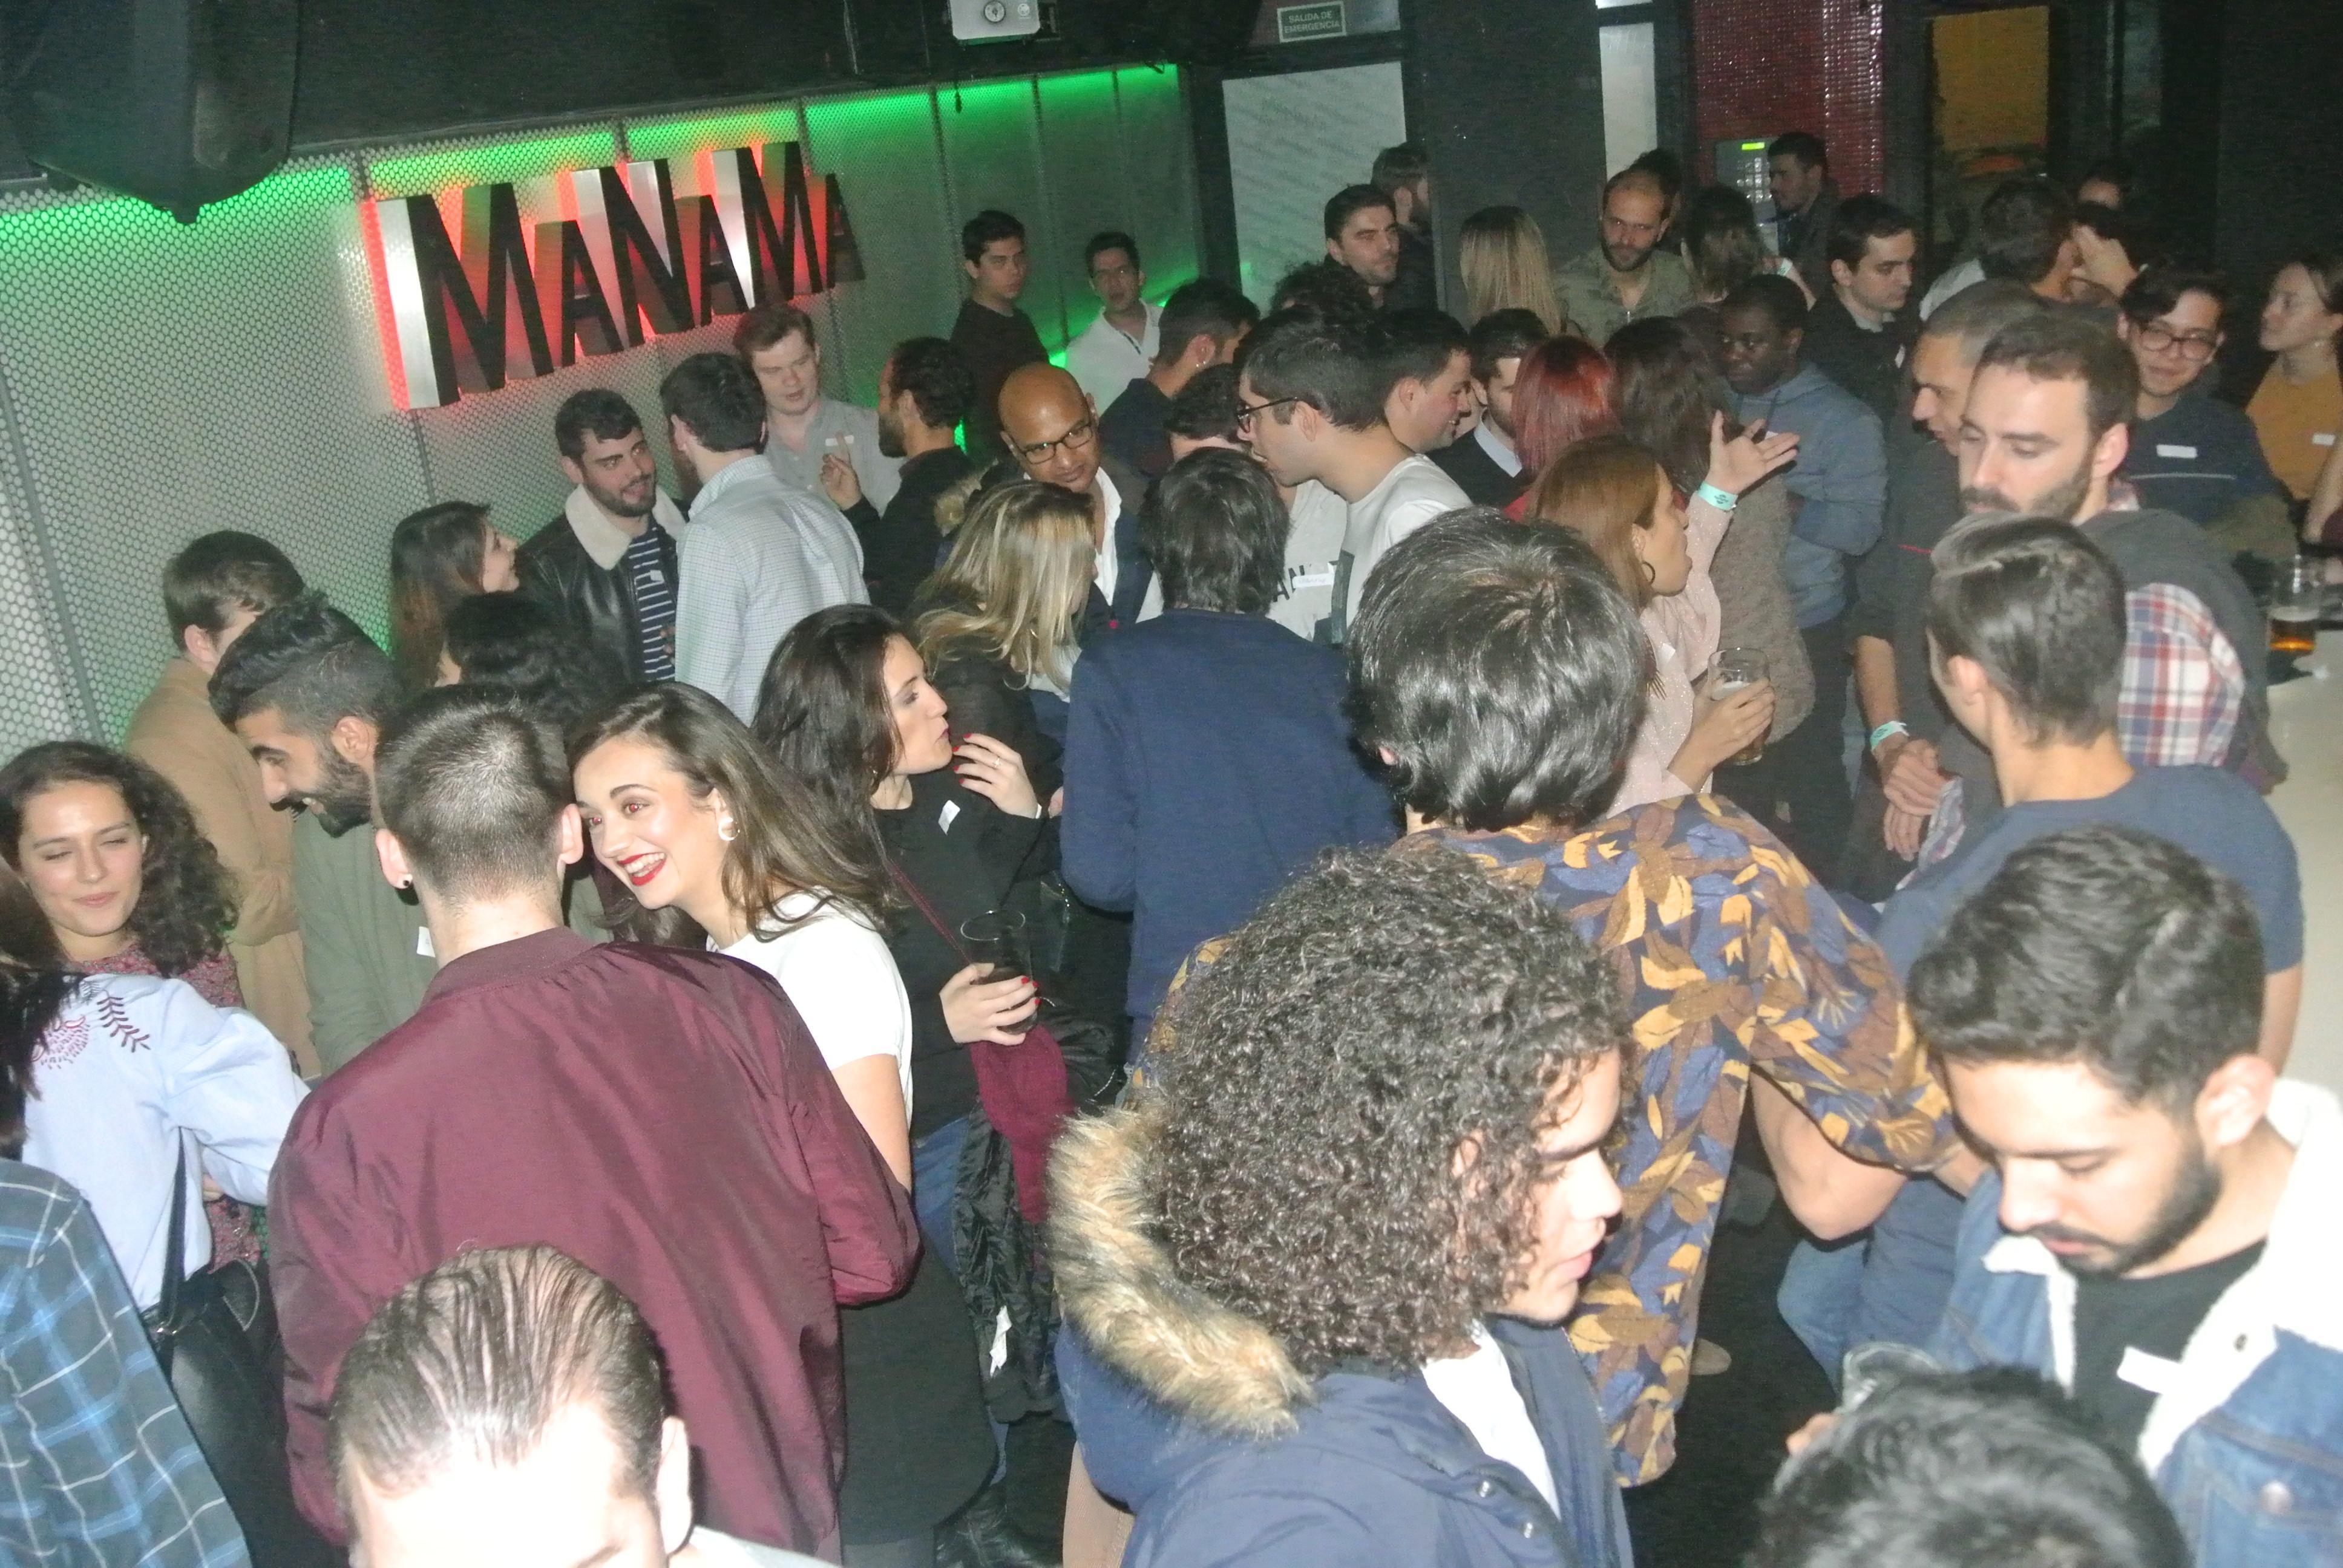 Language Exchange and Party in Madrid on Saturday - Speak & Shake